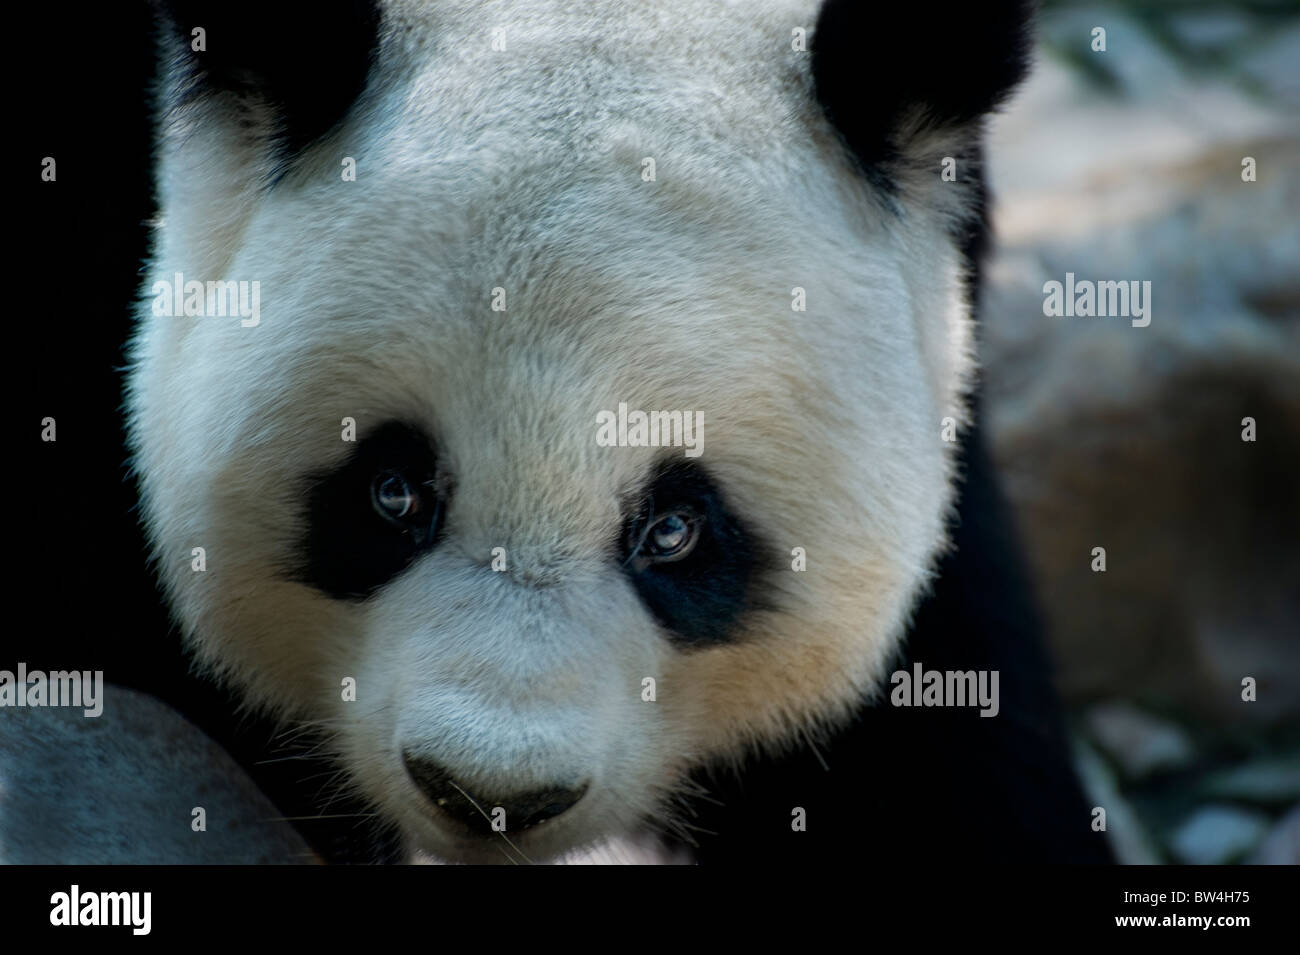 giant Panda bear - Stock Image